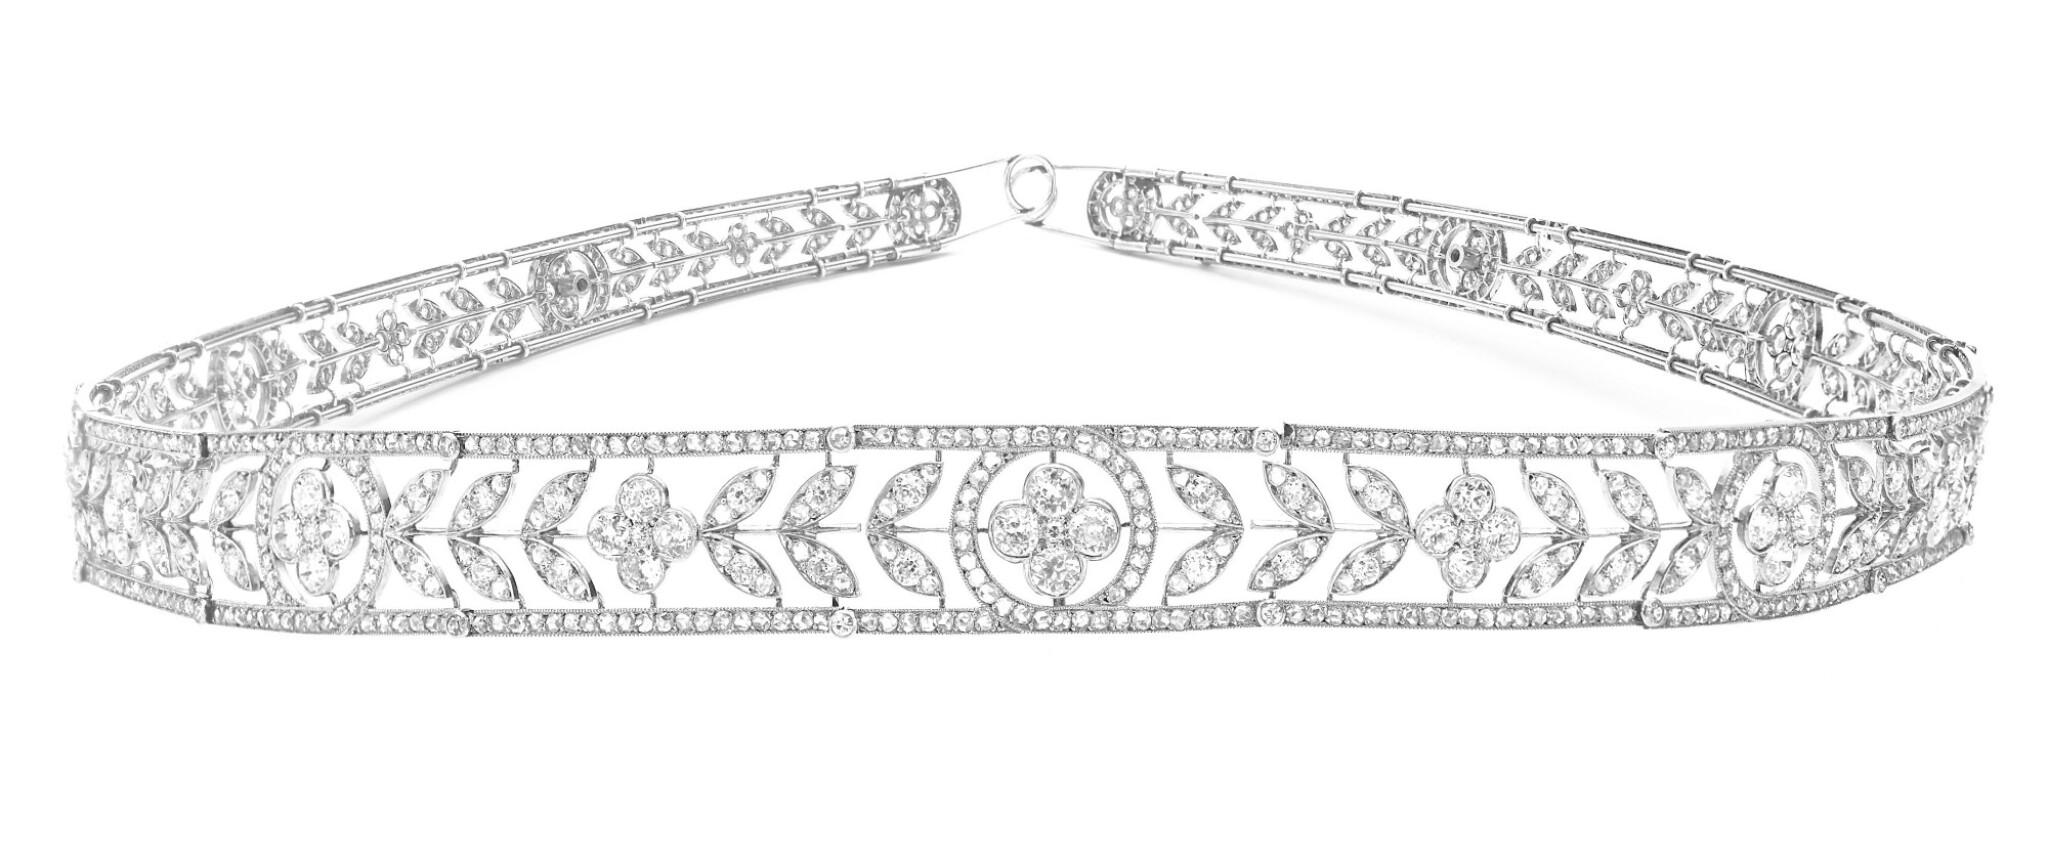 BOUCHERON | DELICATE DIAMOND BANDEAU, CIRCA 1910 [Boucheron|鑽石束髮帶,約1910年]